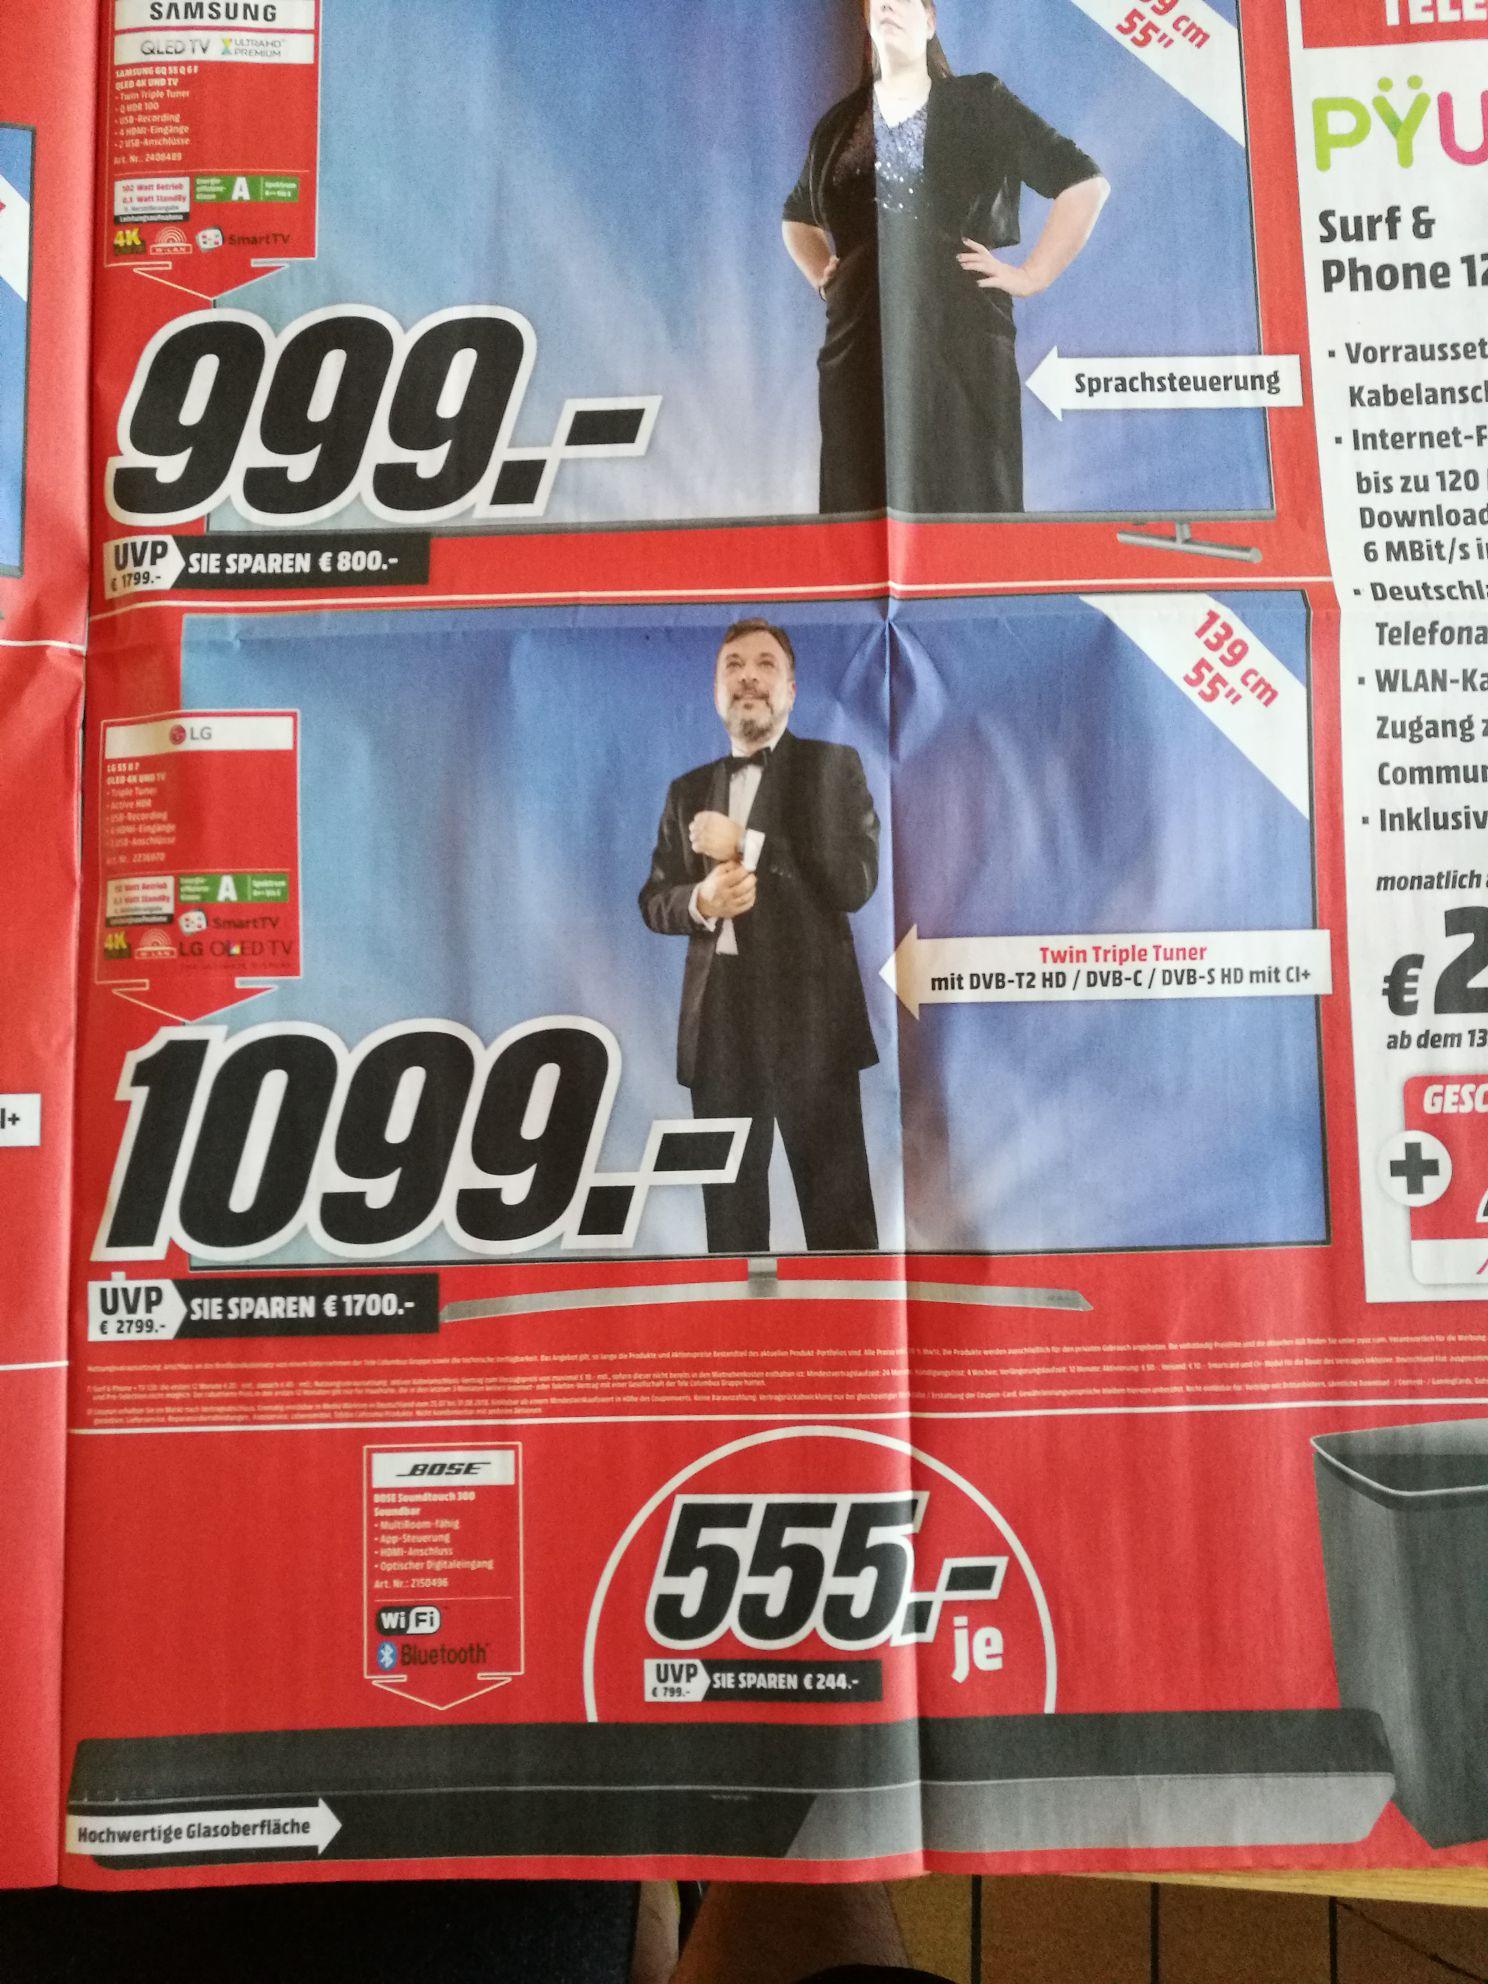 [Lokal] [Sammeldeal] LG 55 B7 OLED TV , PS4, Sony Alpha 6000 uvm München-Haidhausen